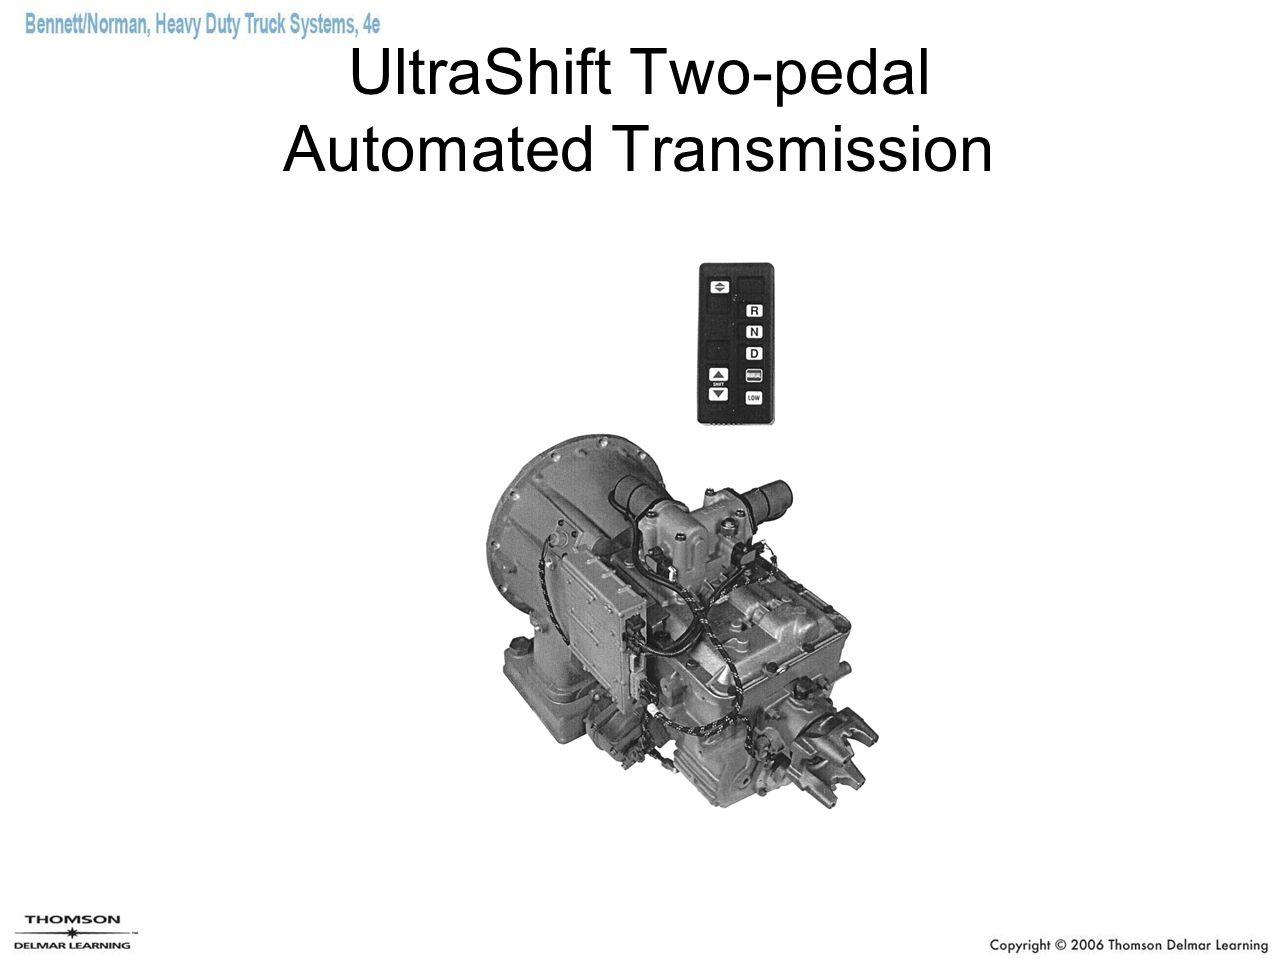 UltraShift Two-pedal Automated Transmission